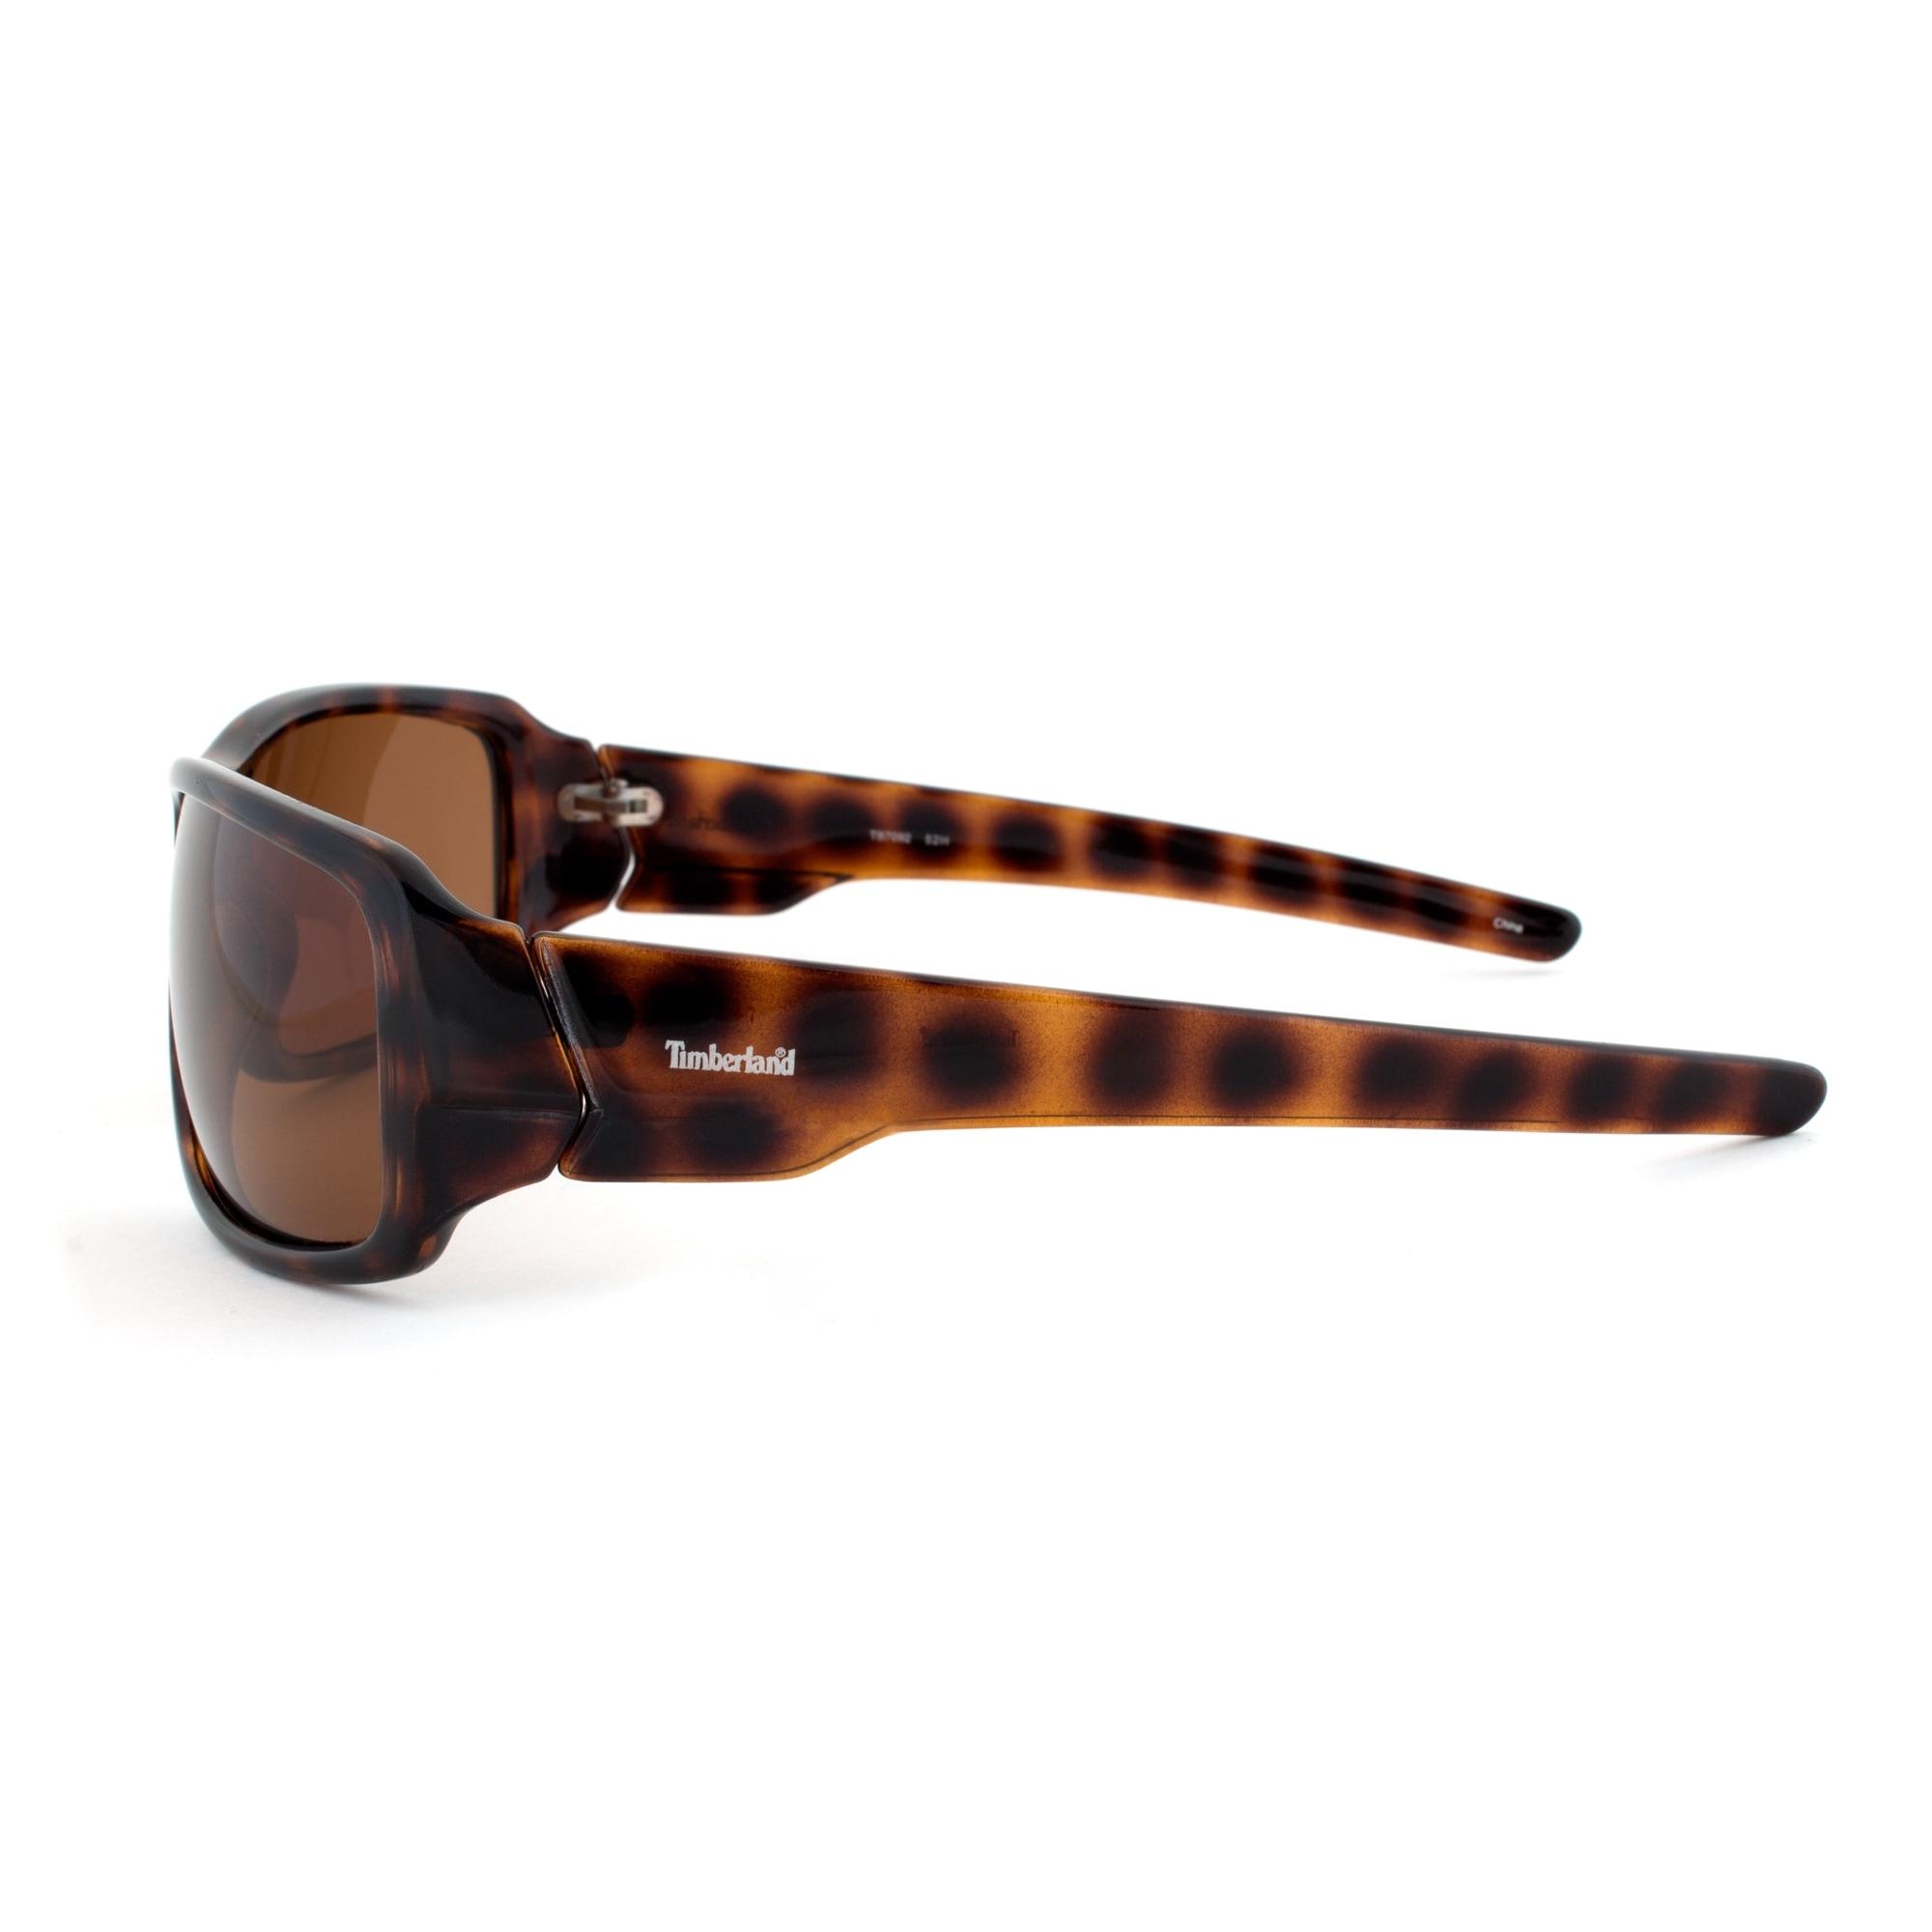 bb01497932b8 Shop Timberland TB7092 52H Rectangular Sunglasses - Free Shipping Today -  Overstock - 20760425